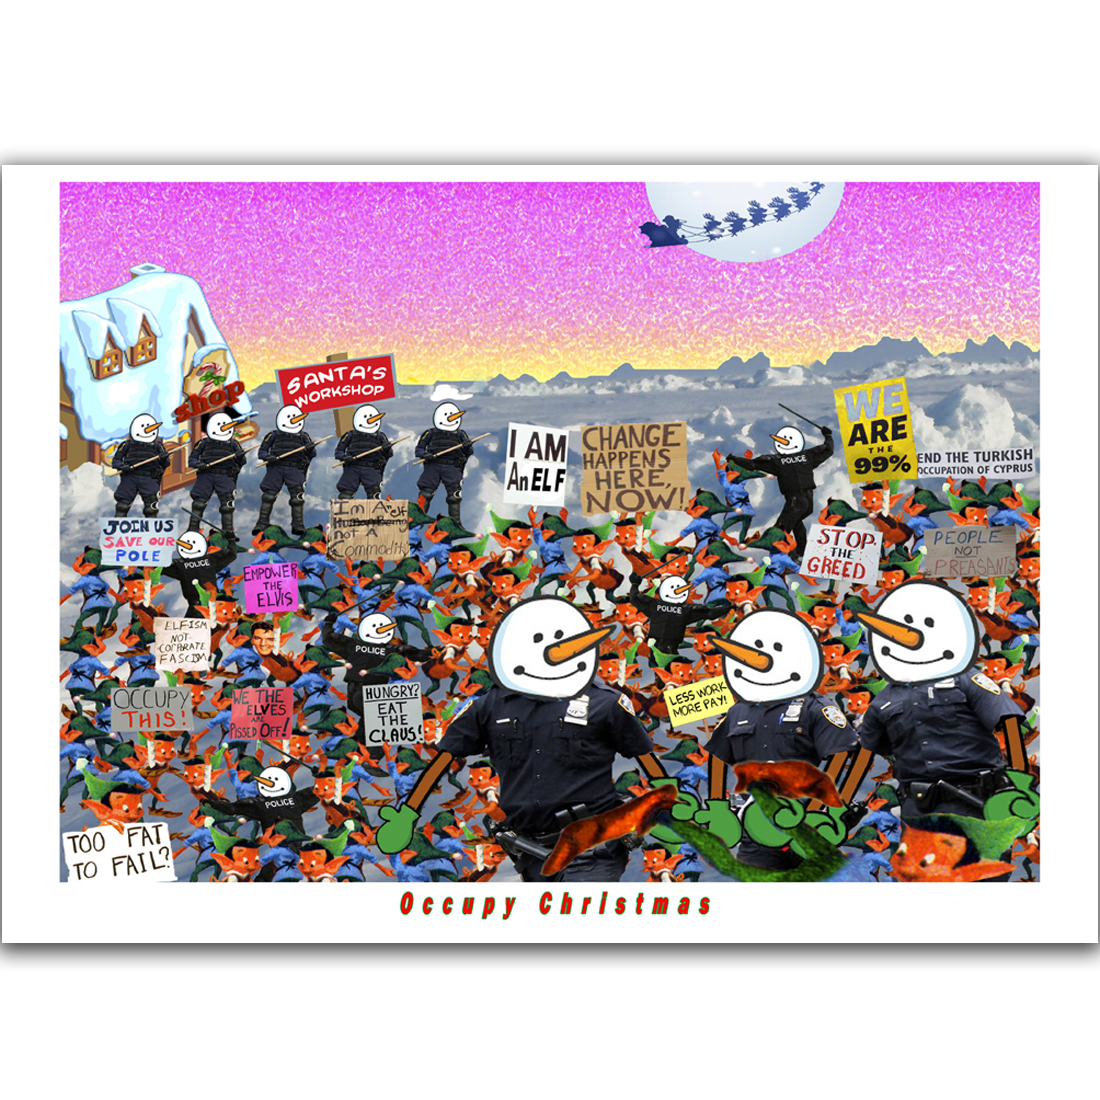 C426 Occupy Christmas